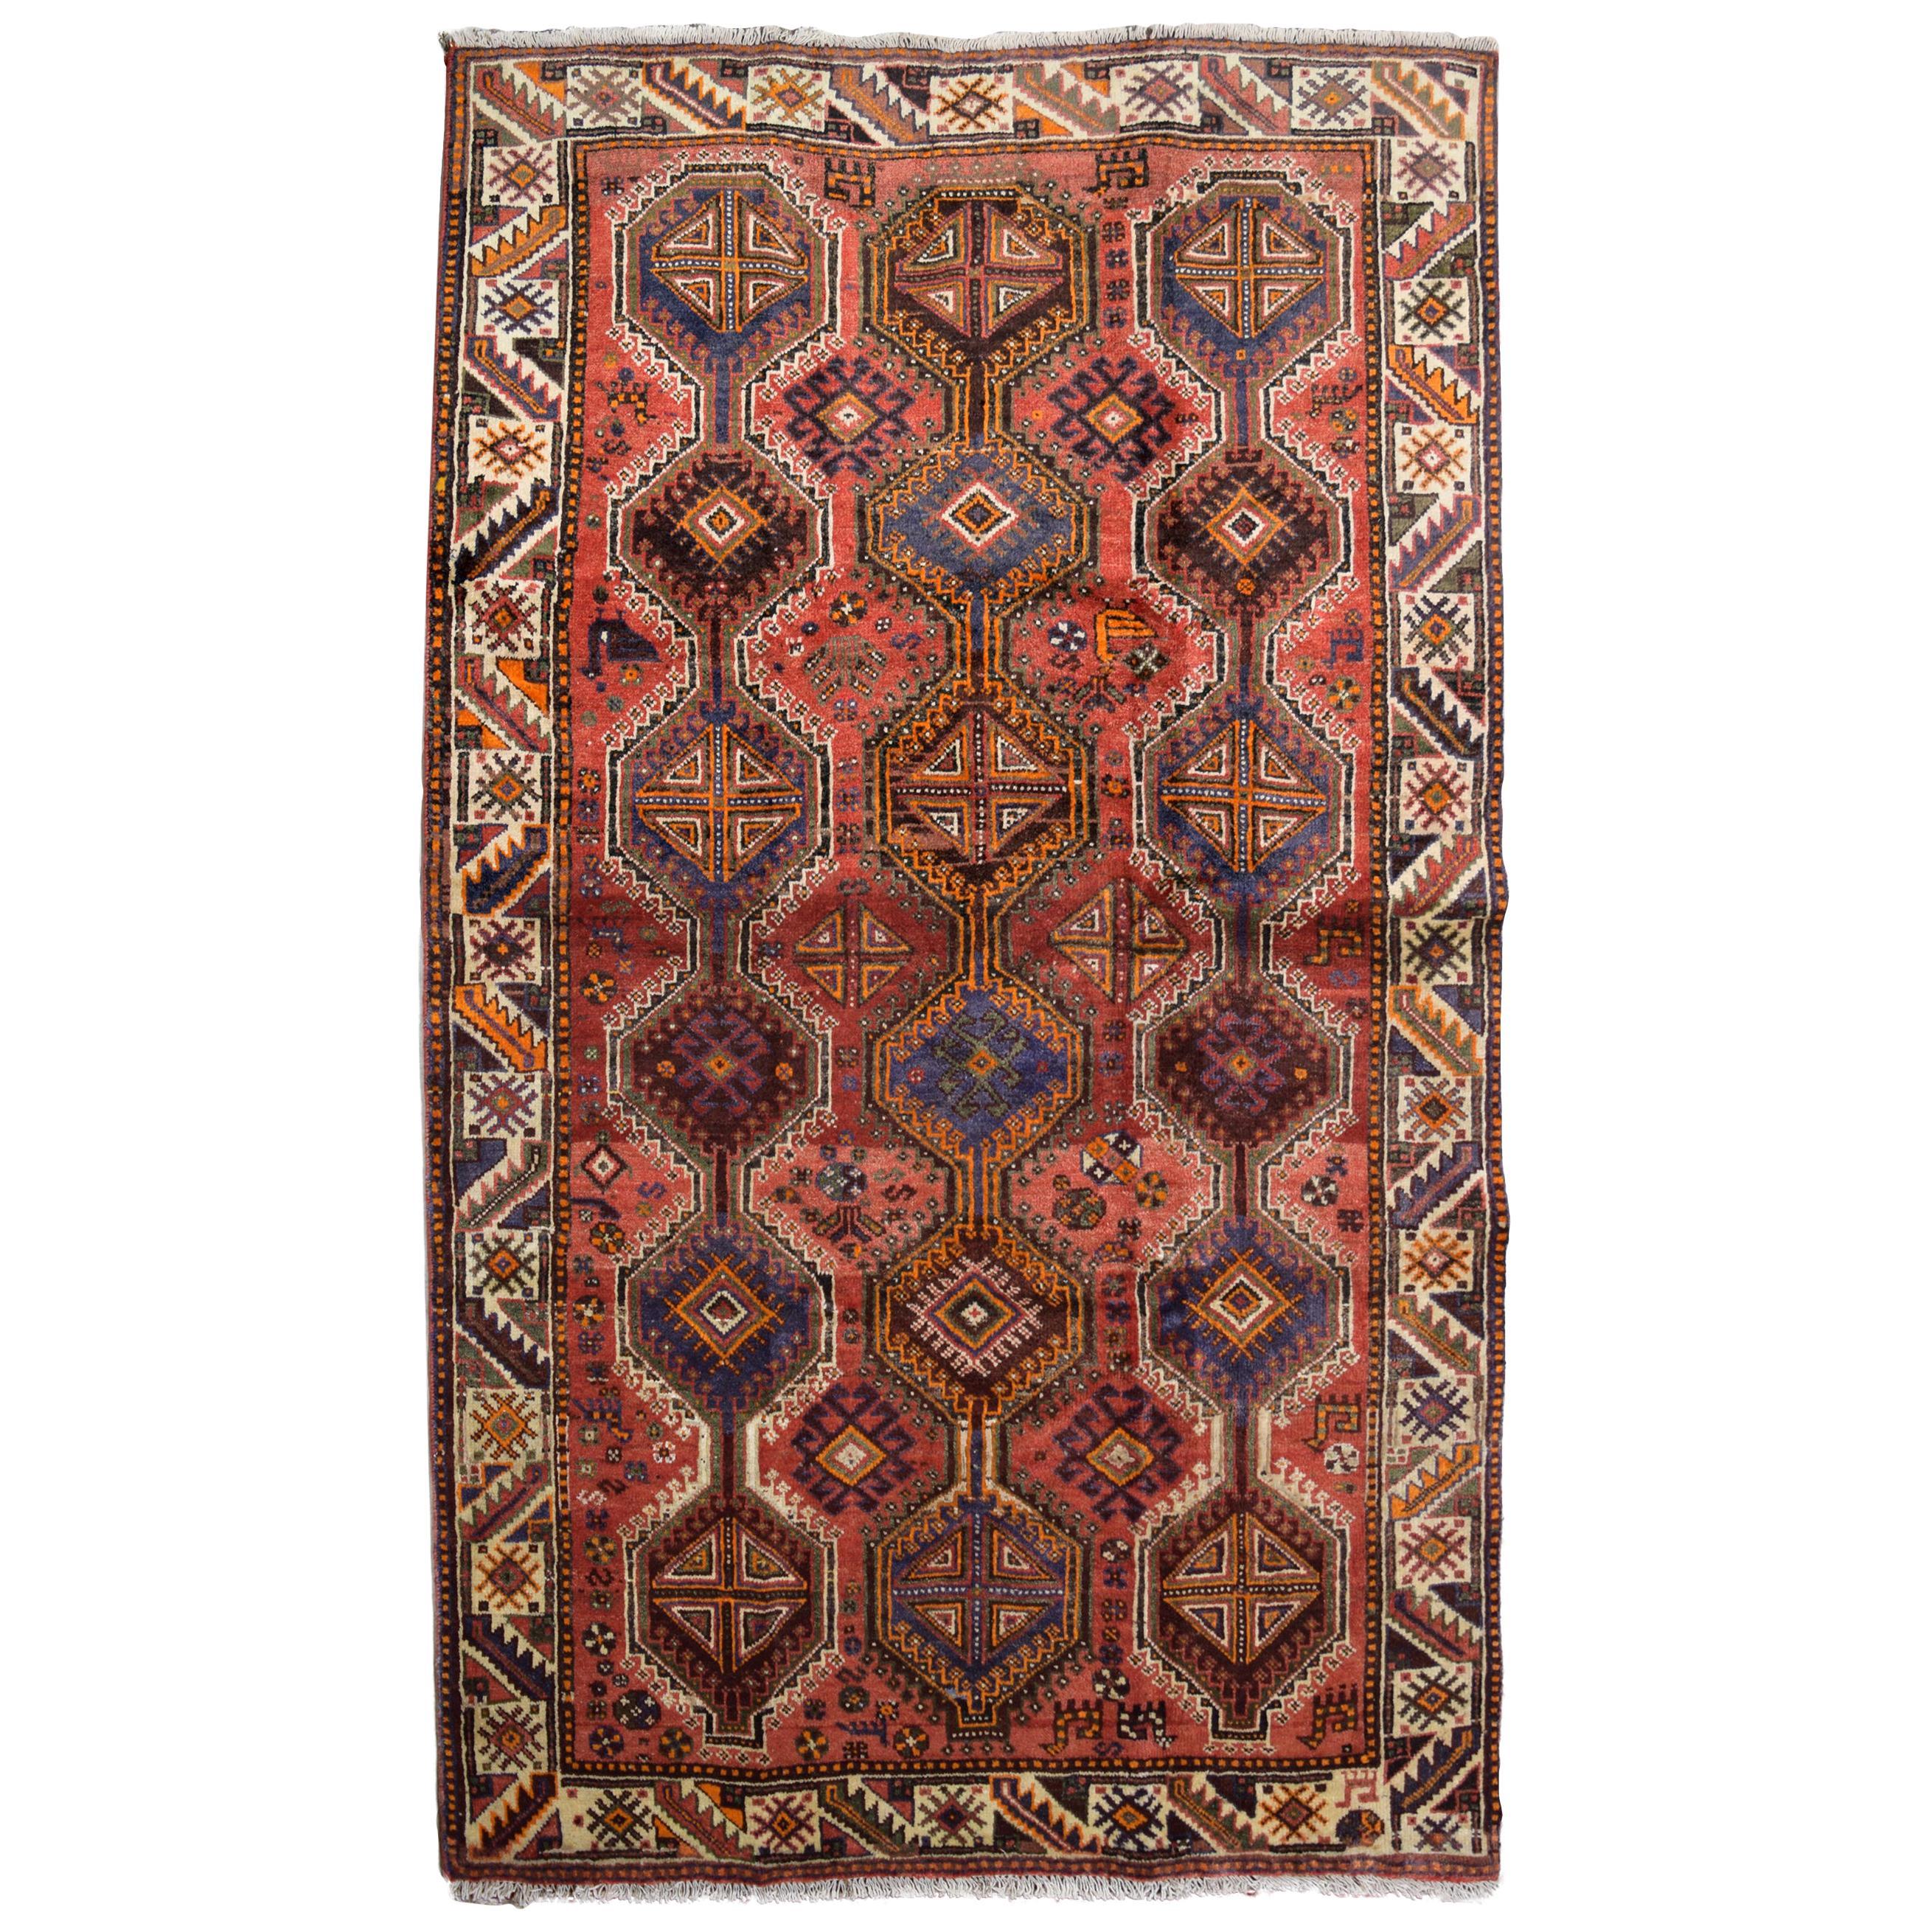 Rustic Red, Pink, and Cream Persian Ghashghai Carpet